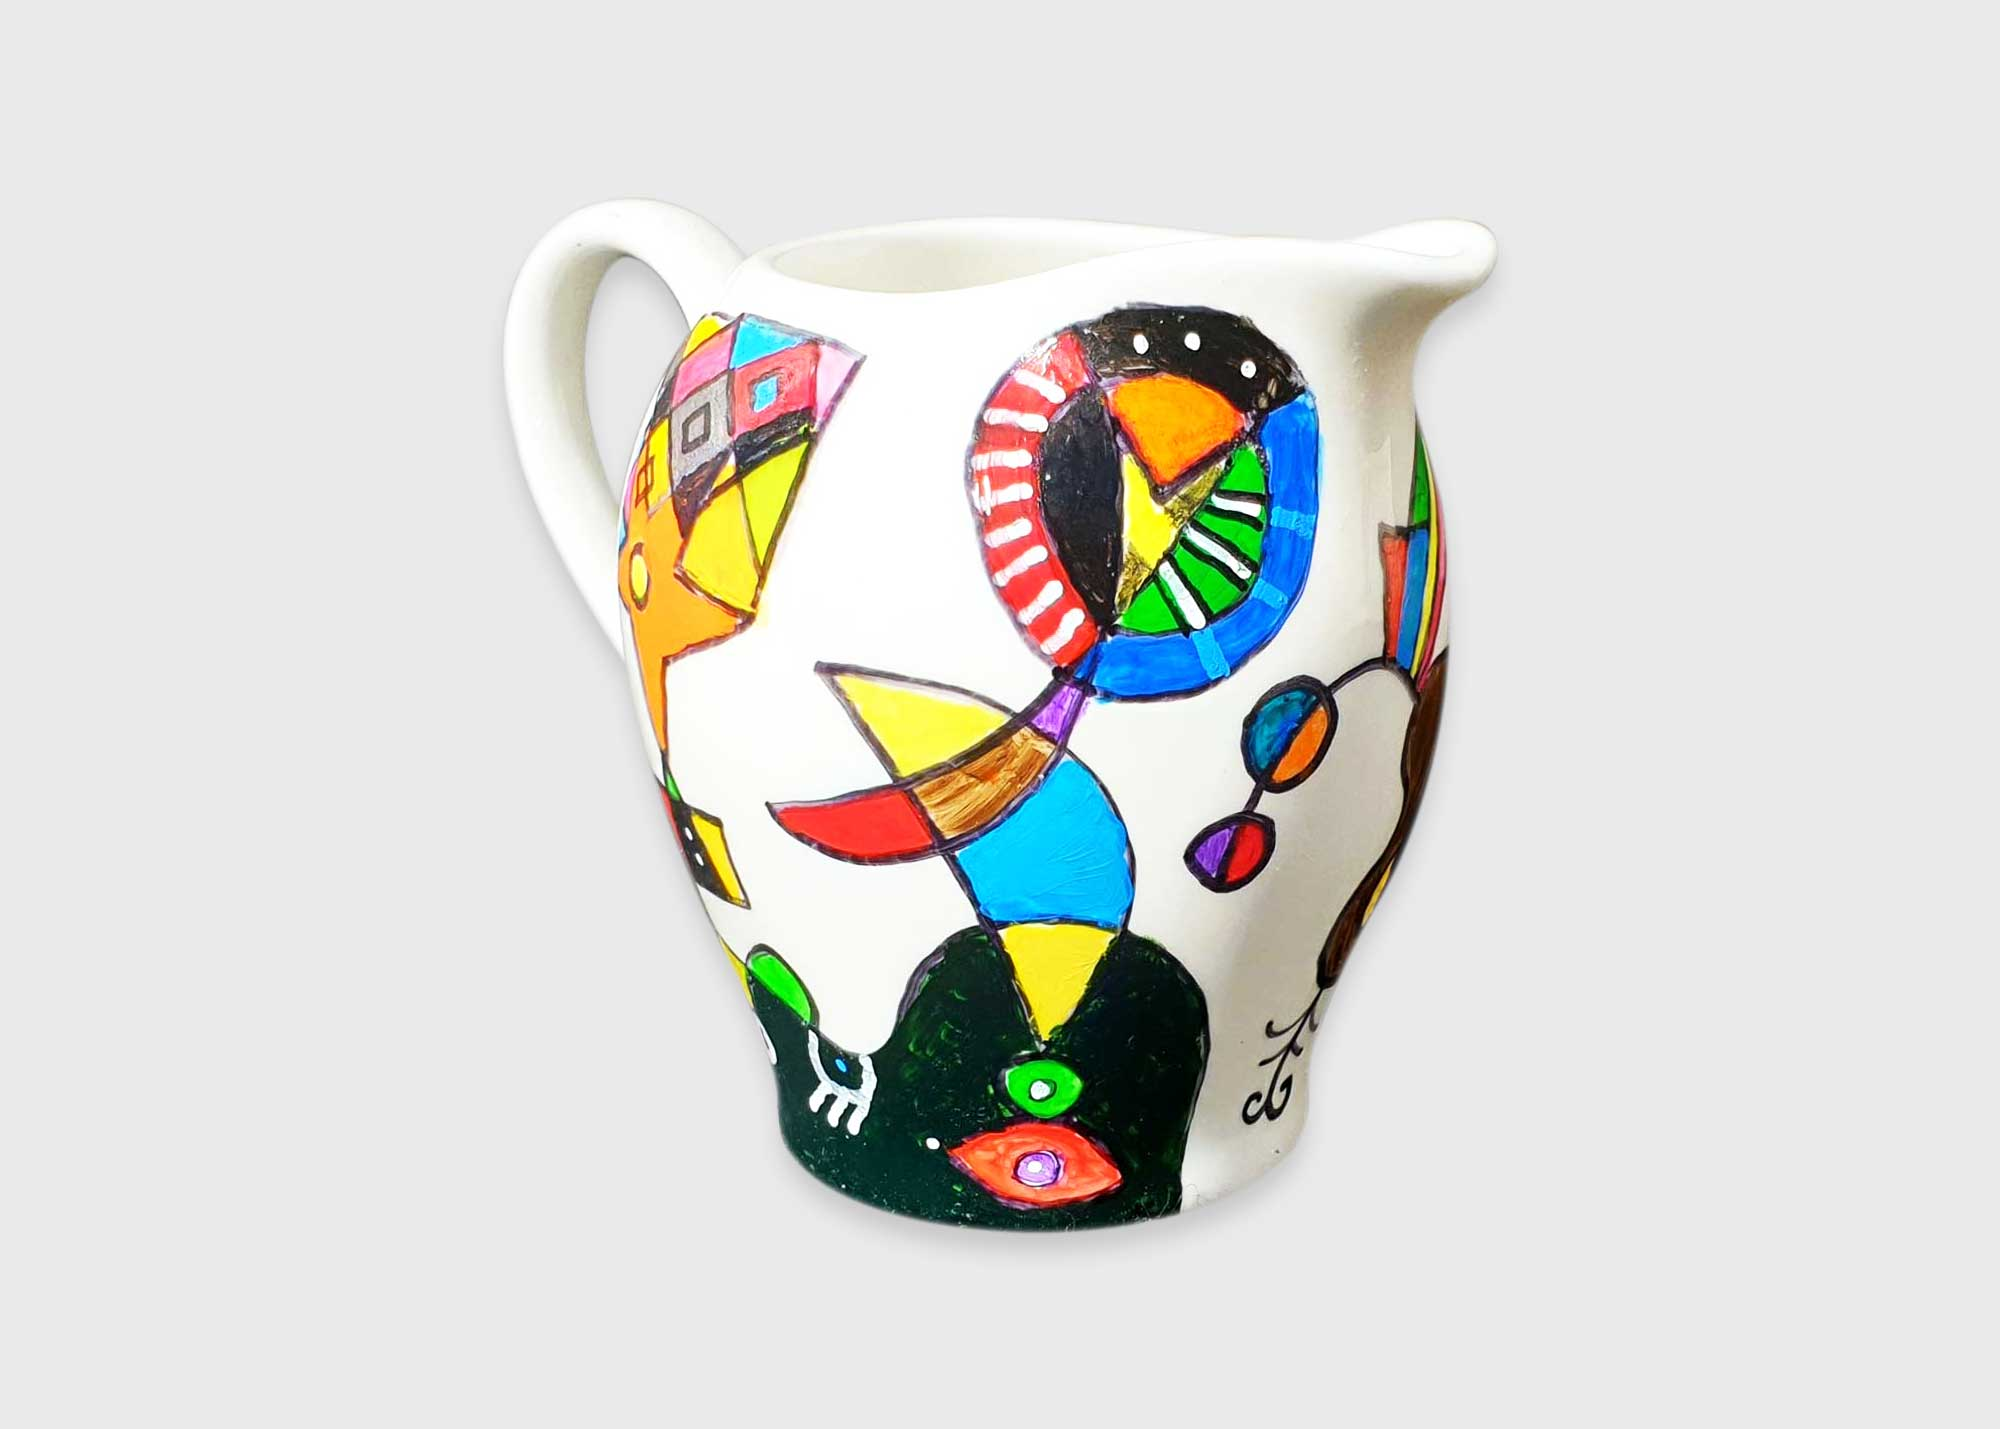 hand-painted jug